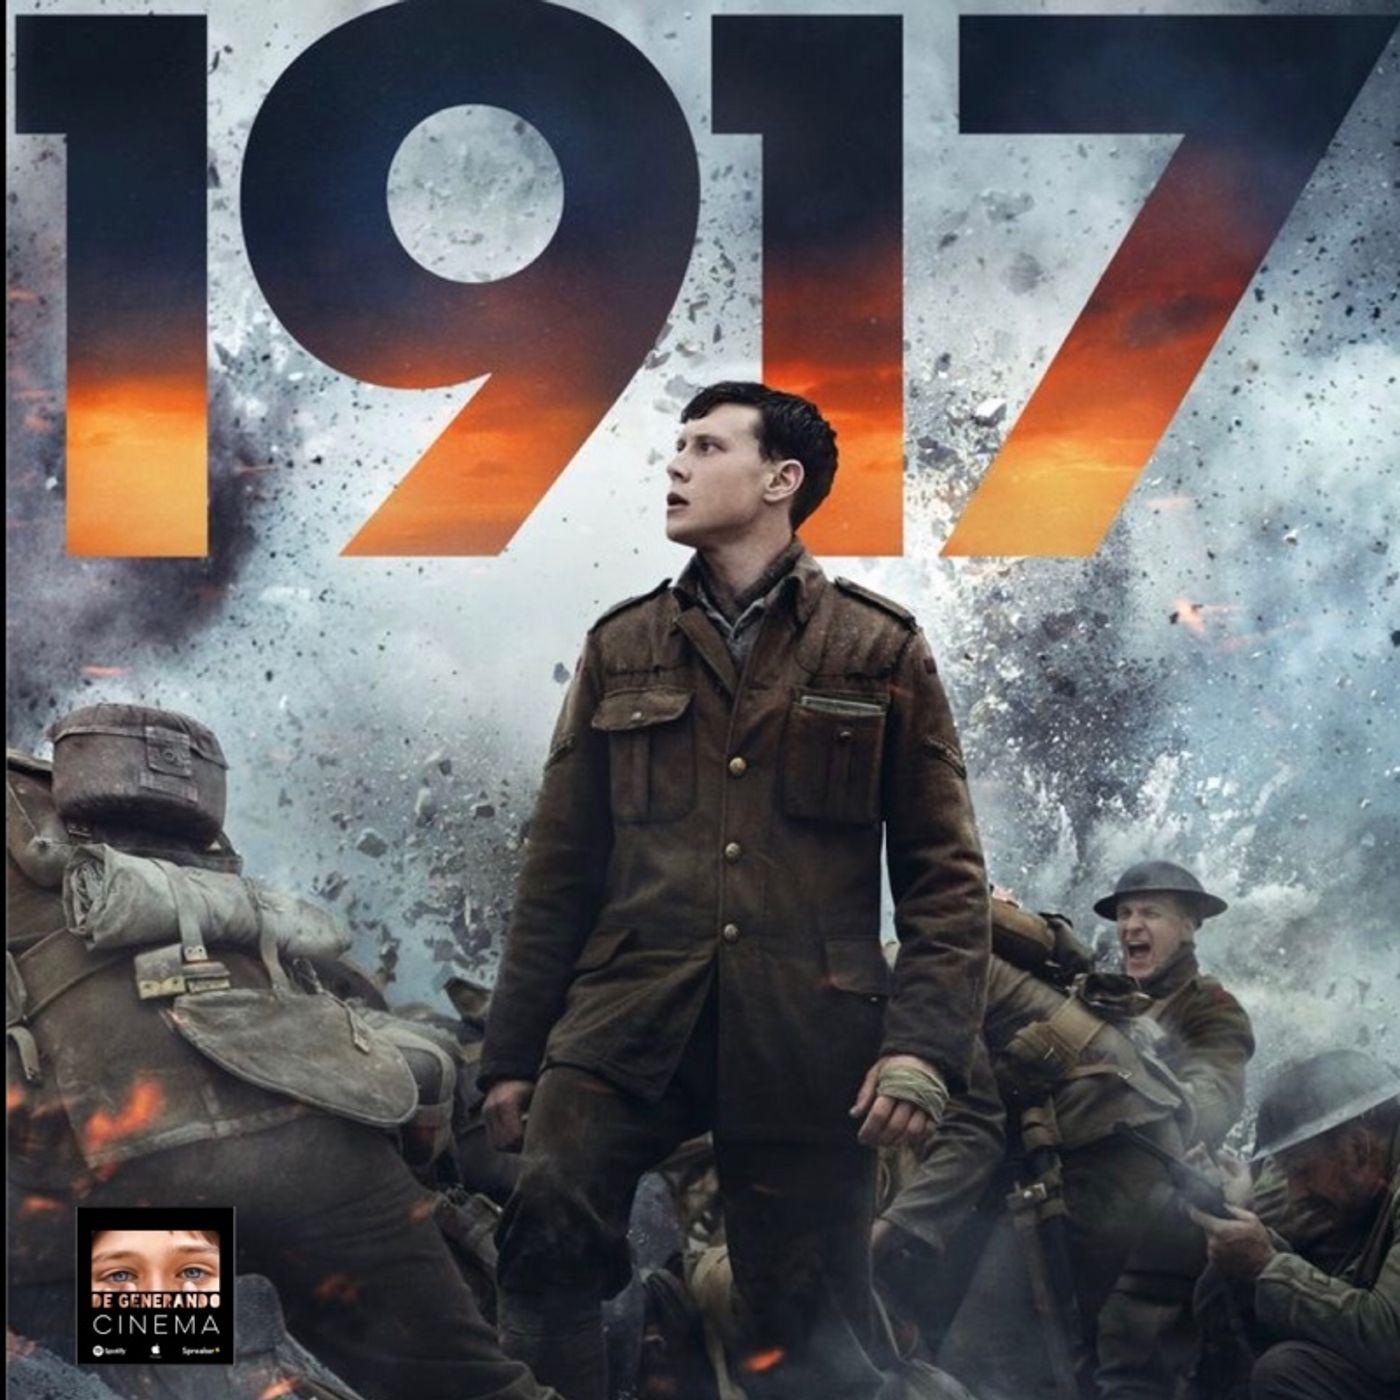 1917 - La guerra in piano sequenza